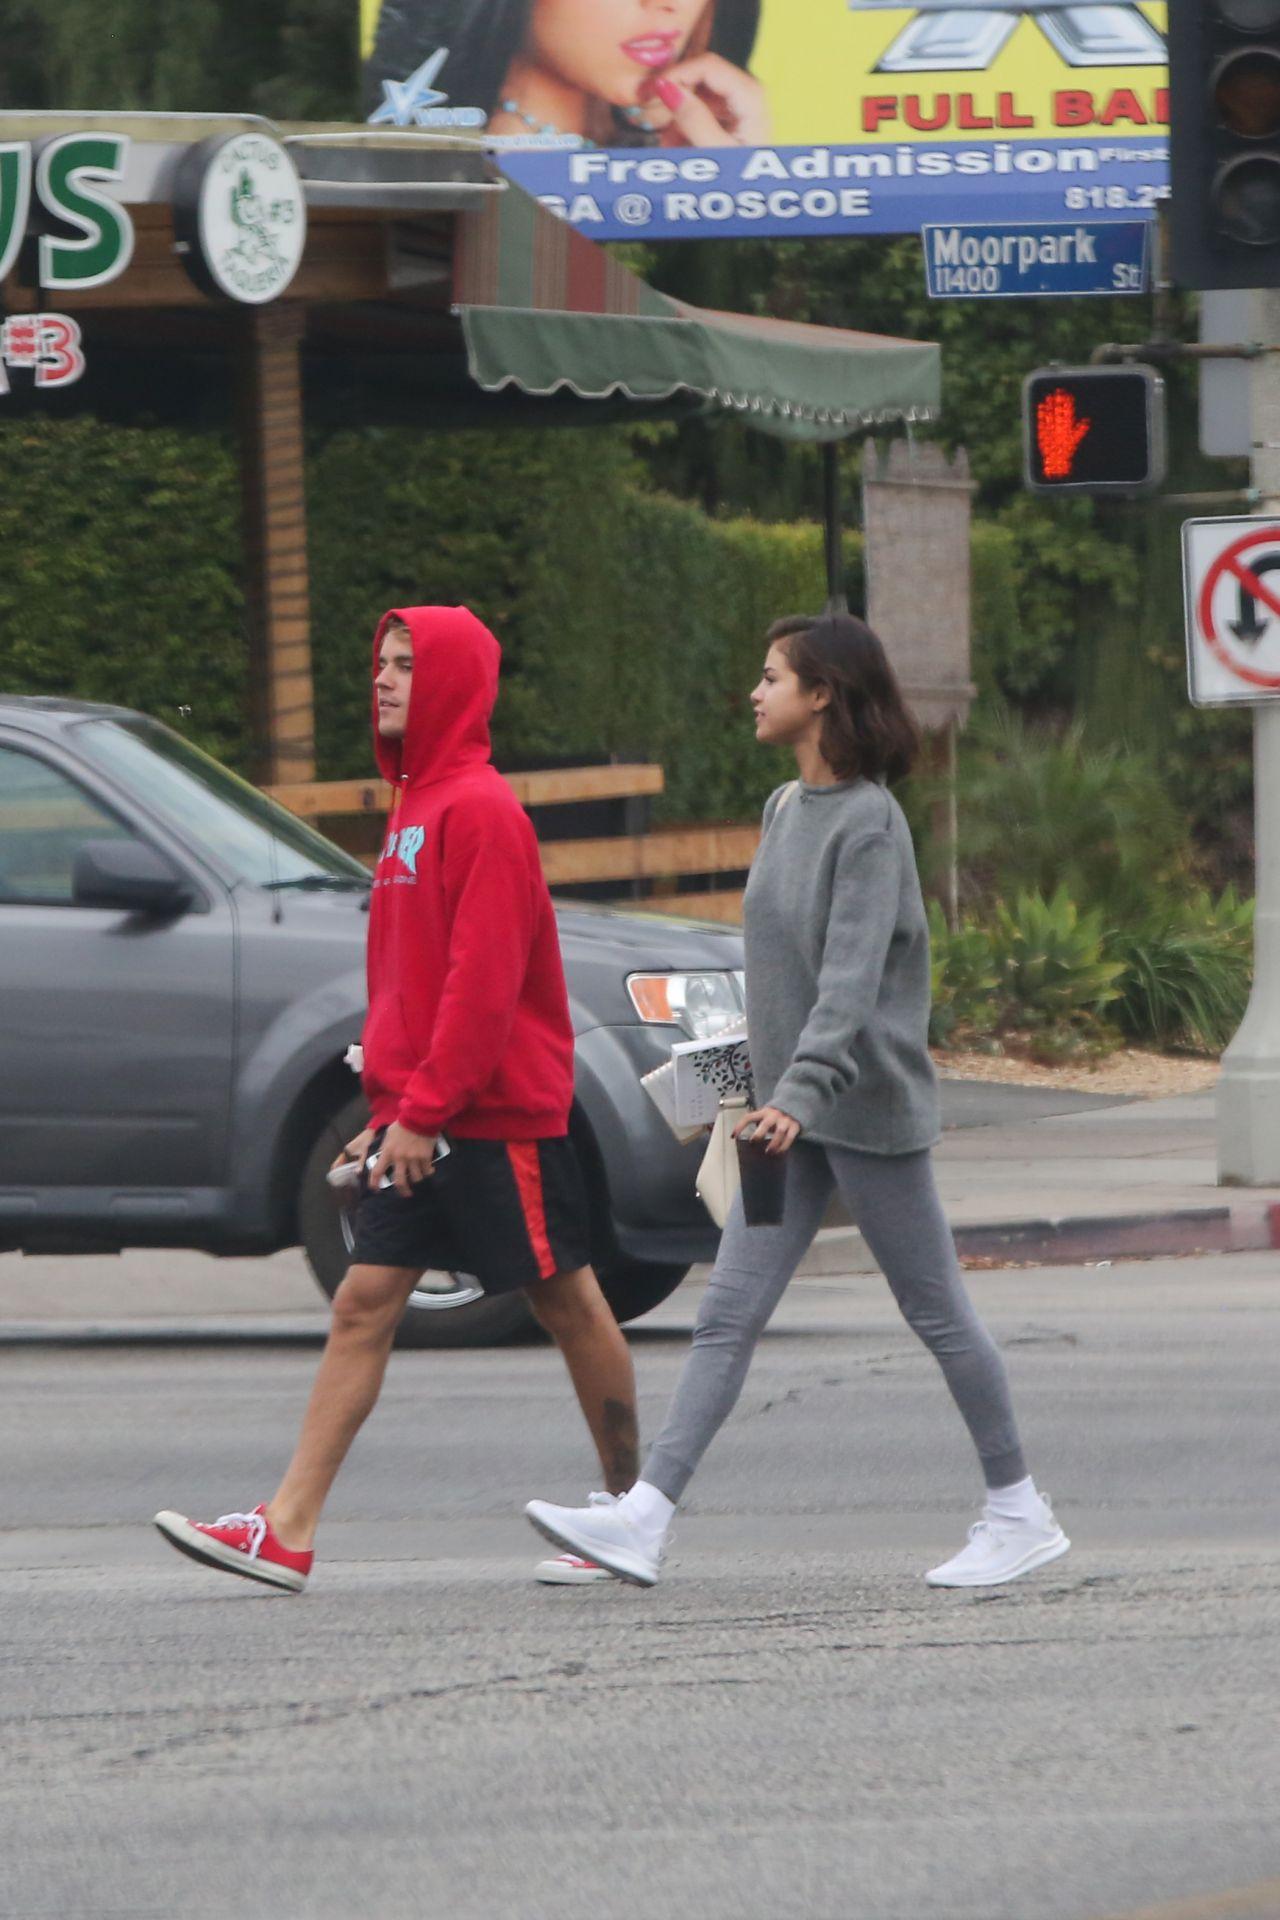 ¿Cuánto mide Selena Gomez? - Altura - Real height Selena-gomez-goes-for-a-walk-with-justin-bieber-in-la-11-01-2017-0